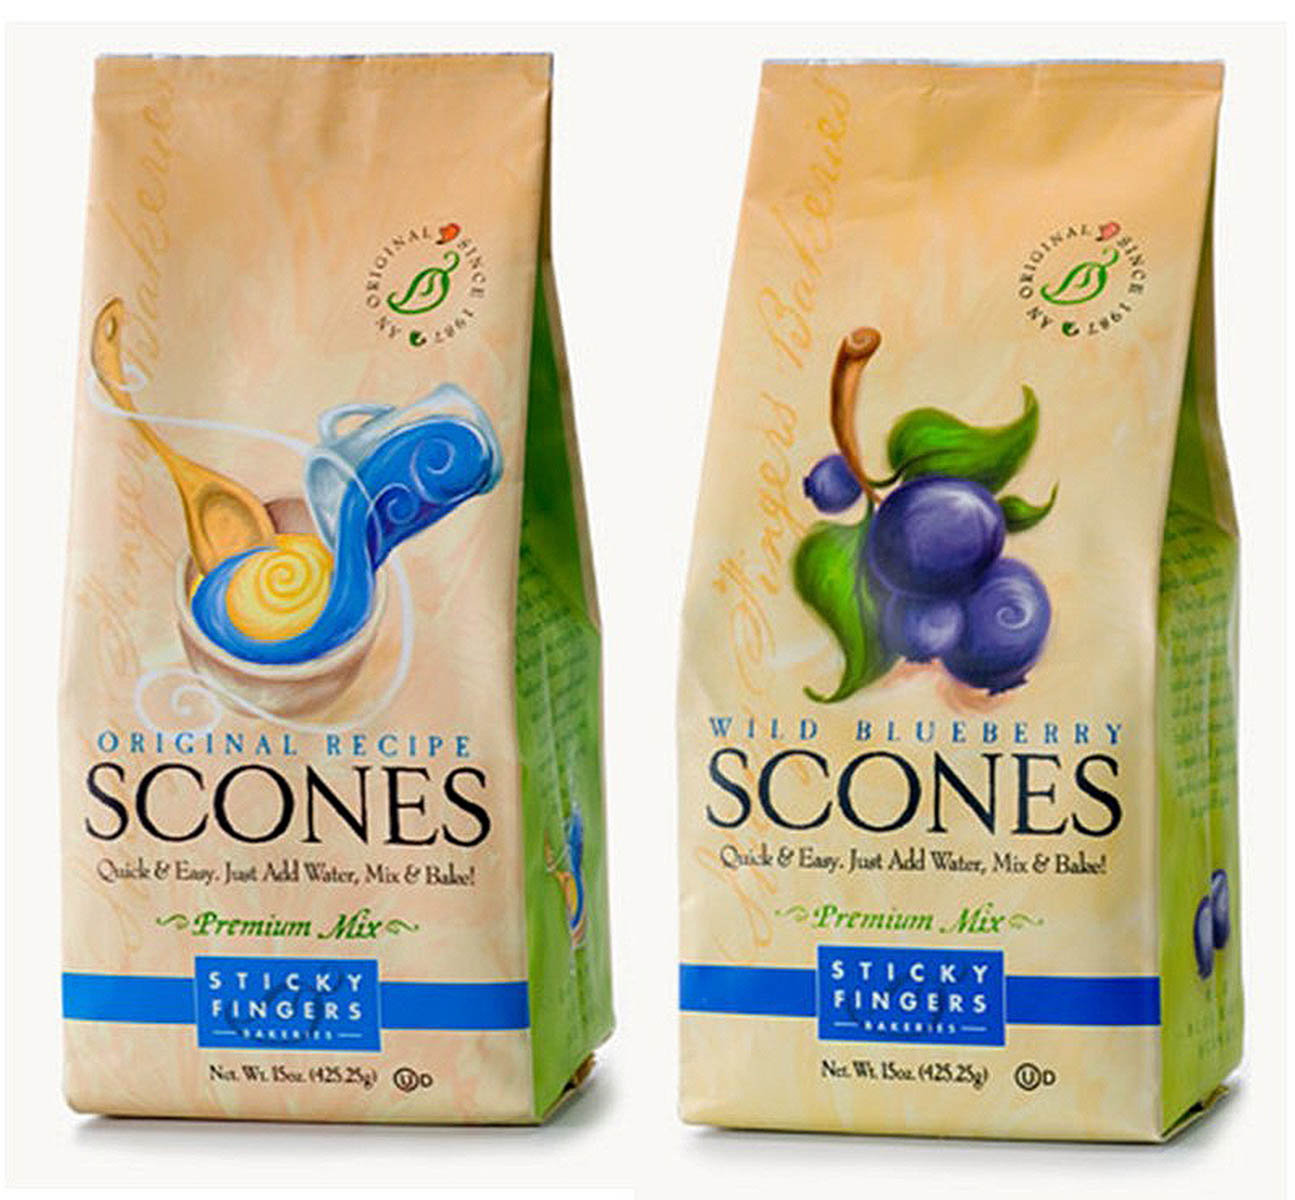 Sticky Fingers Bakeries Original & Wild Blueberry Premium Scones Mix 16 Oz. Set of 2 by